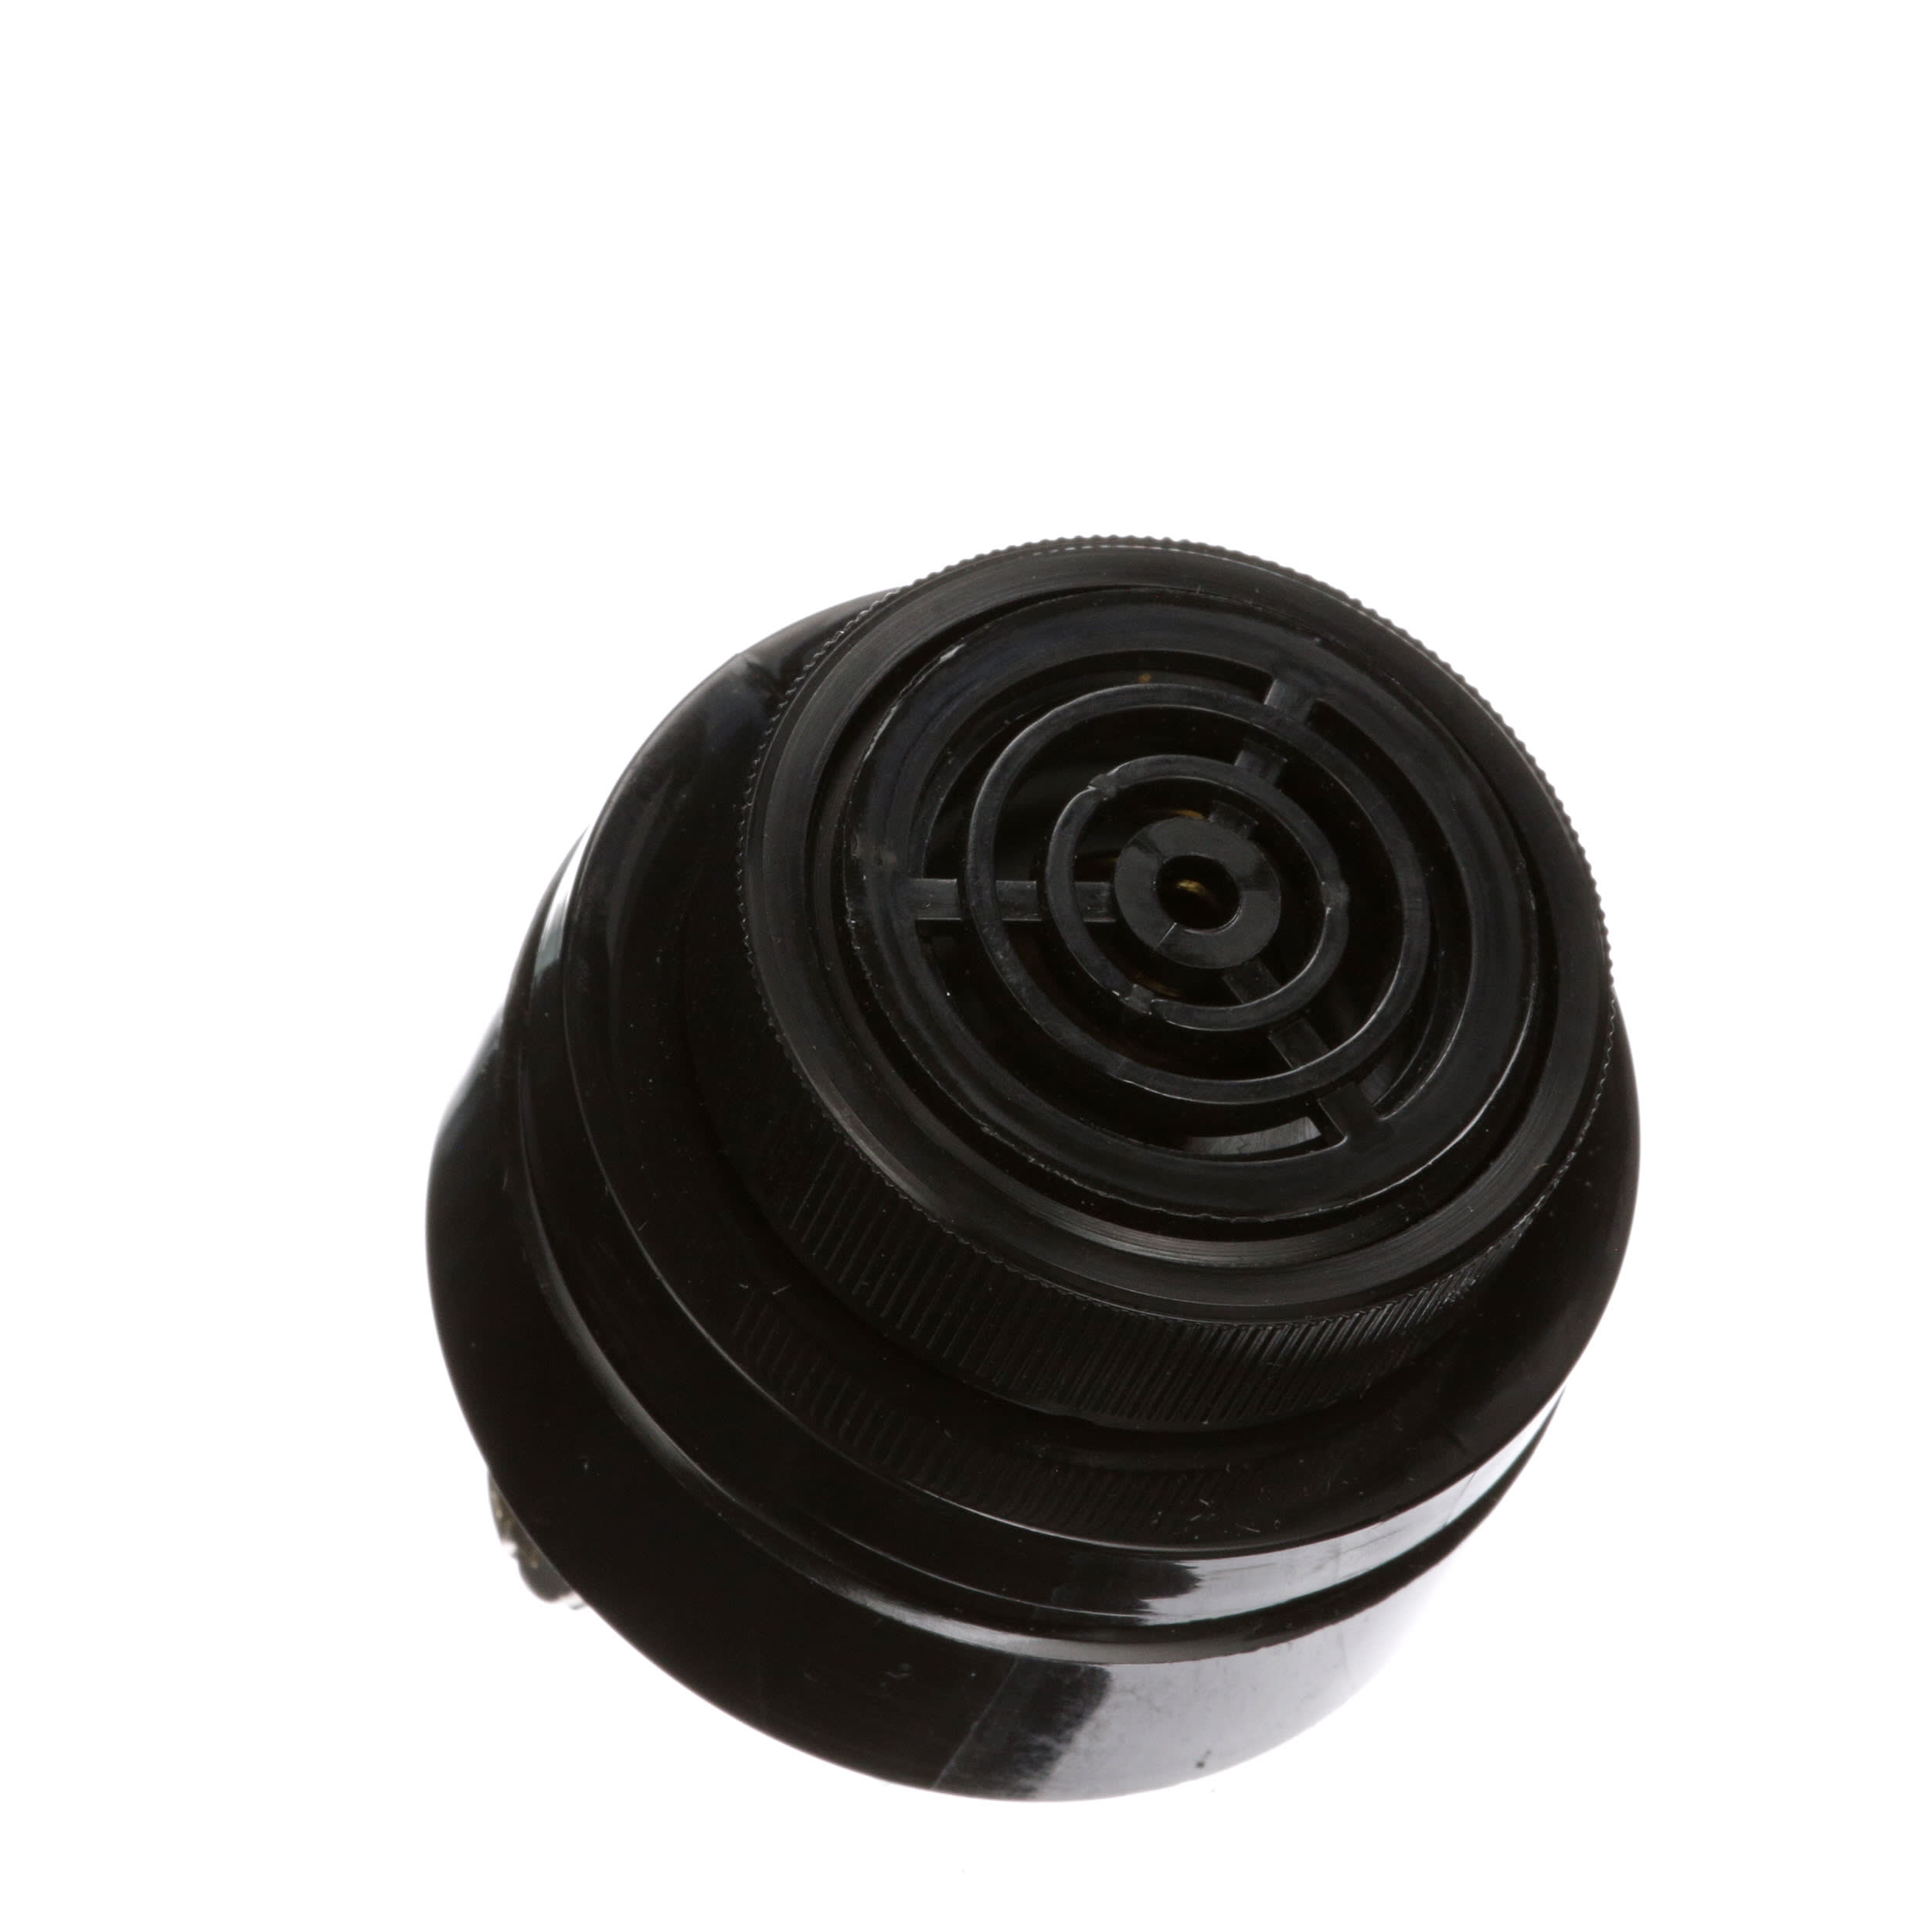 Mallory SC628 Sonalert Buzzer Alarm 77055 for sale online